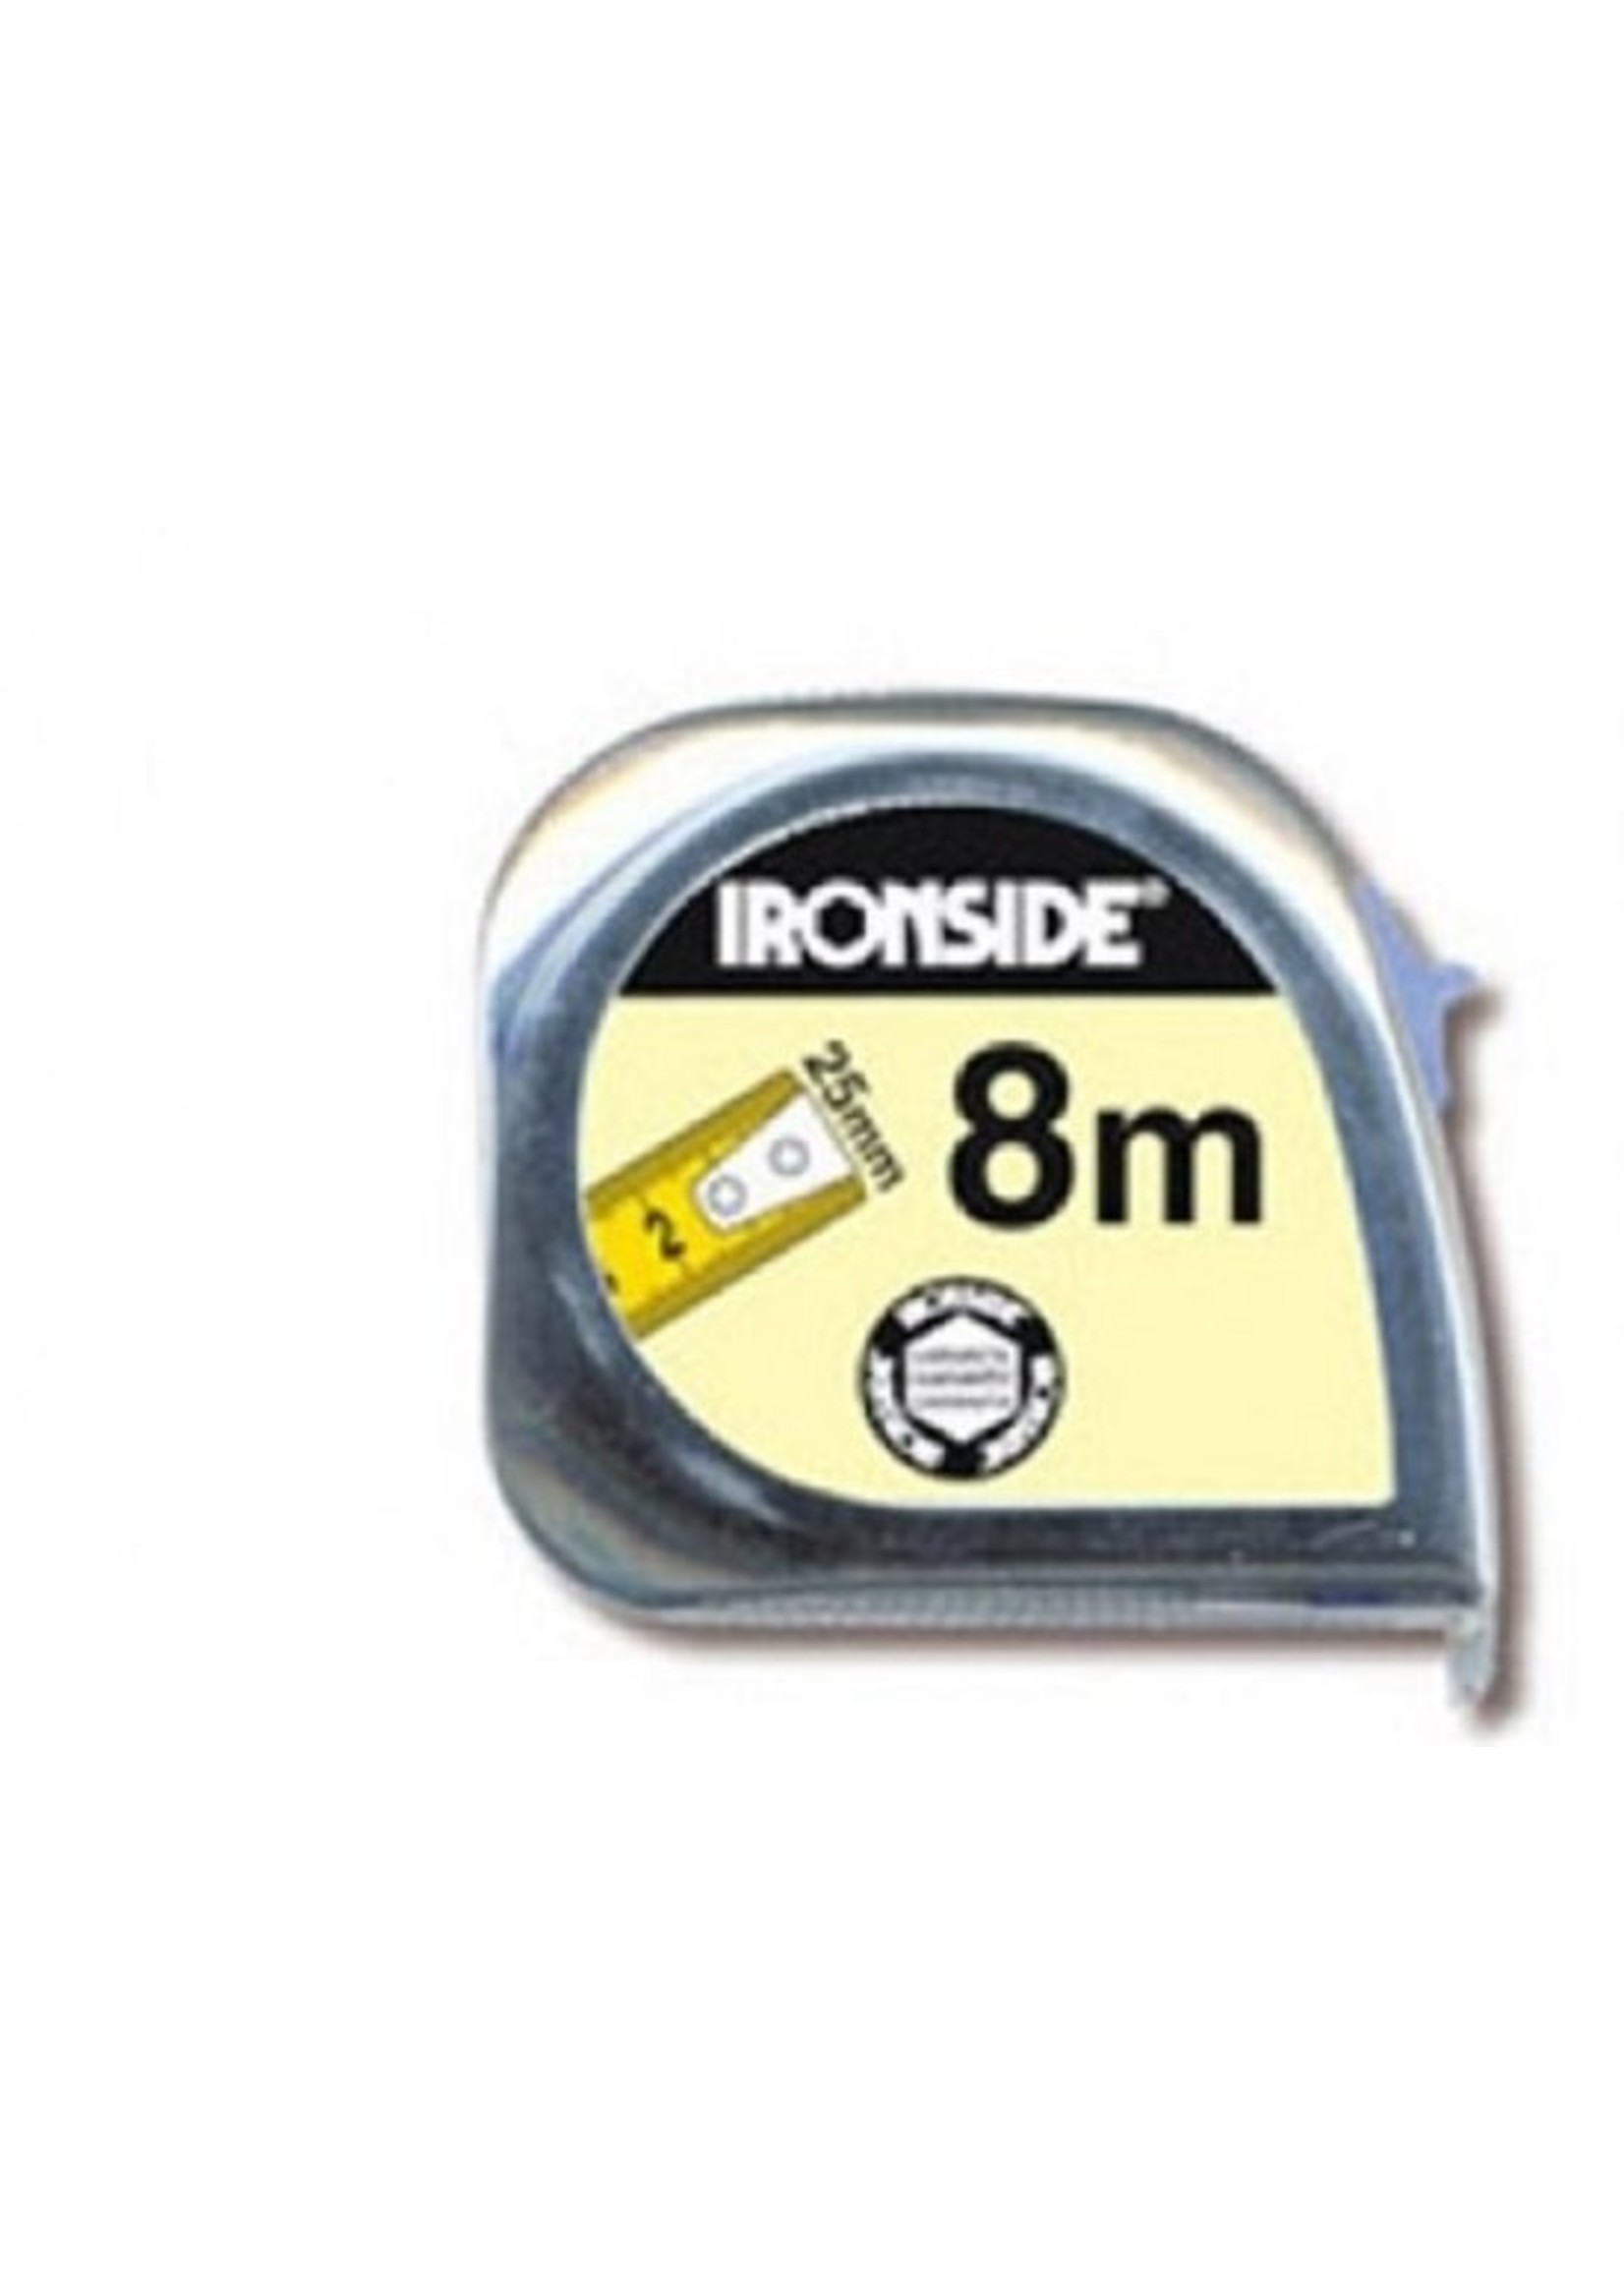 Ironside Ironside ABS rolmaat 8m